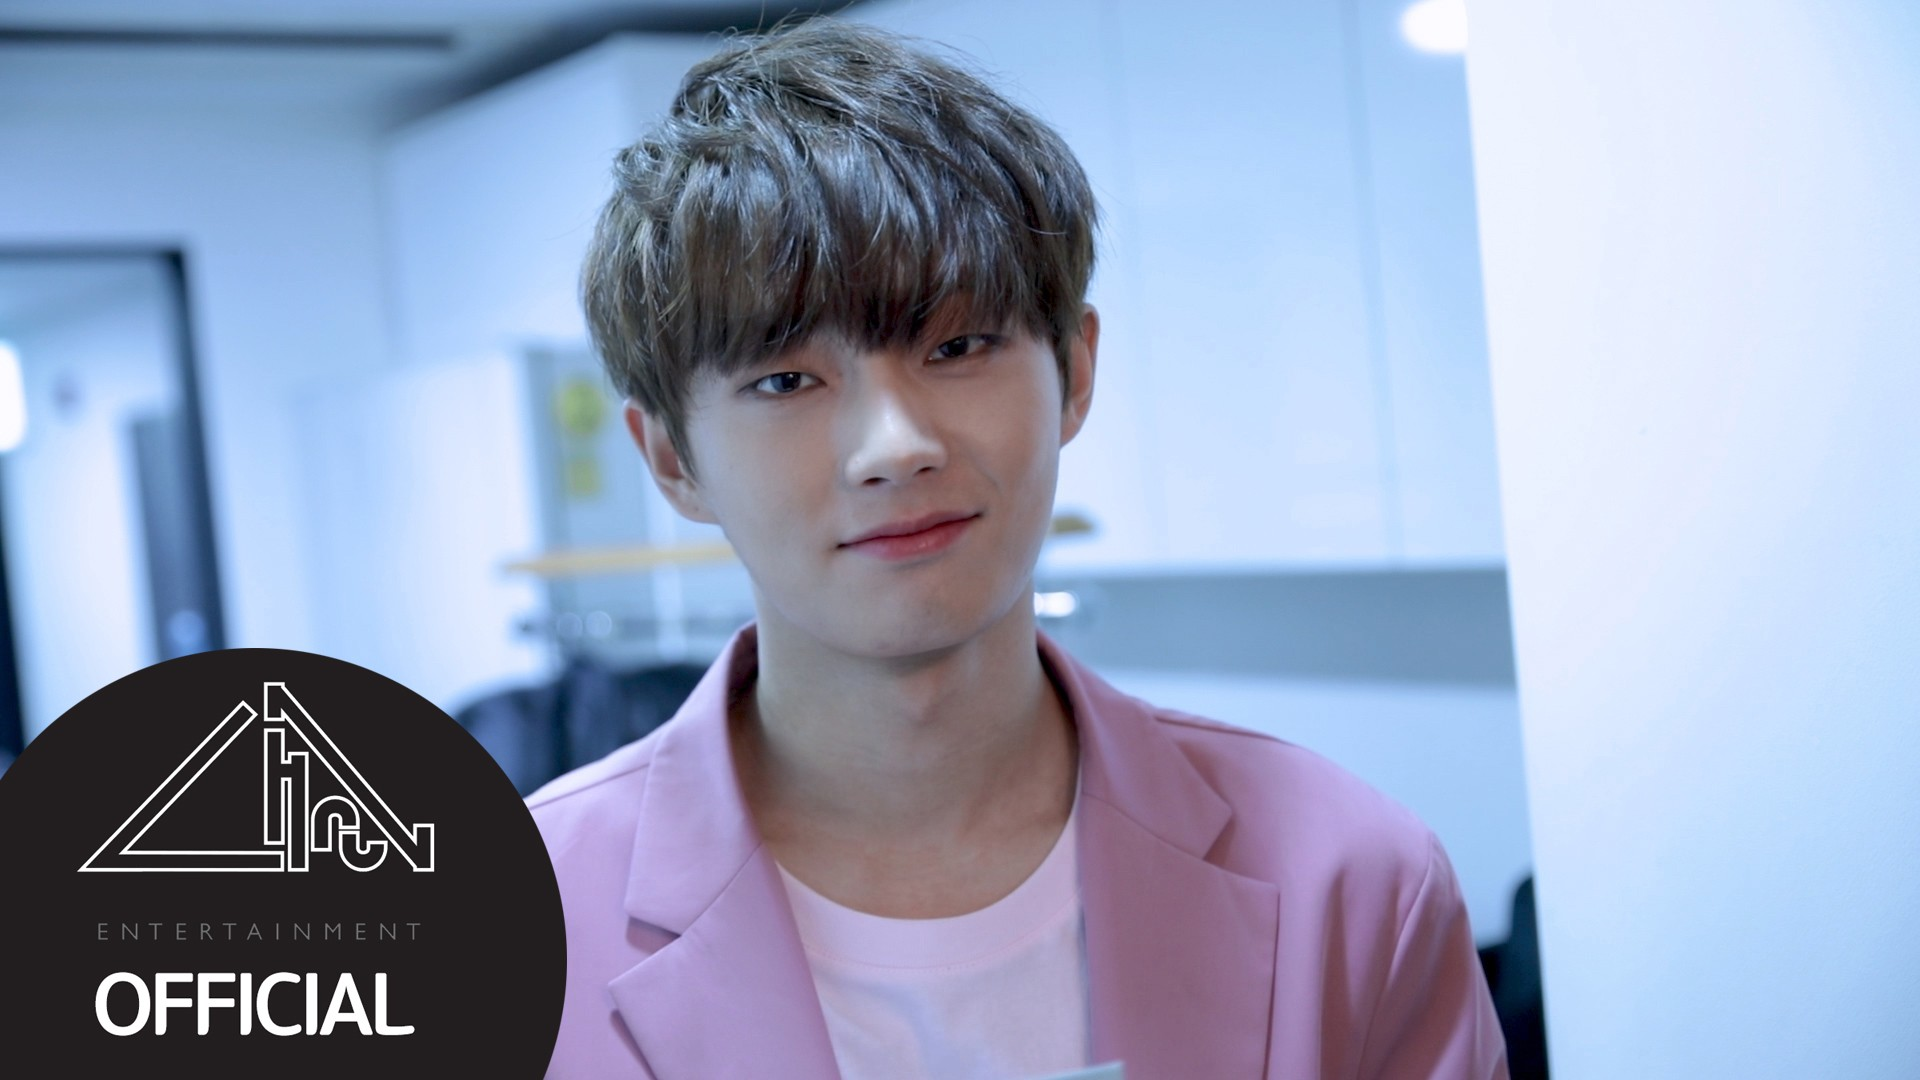 [BEHIND] 용국(LONGGUO) SBS MTV 더쇼 MC 첫방송 비하인드